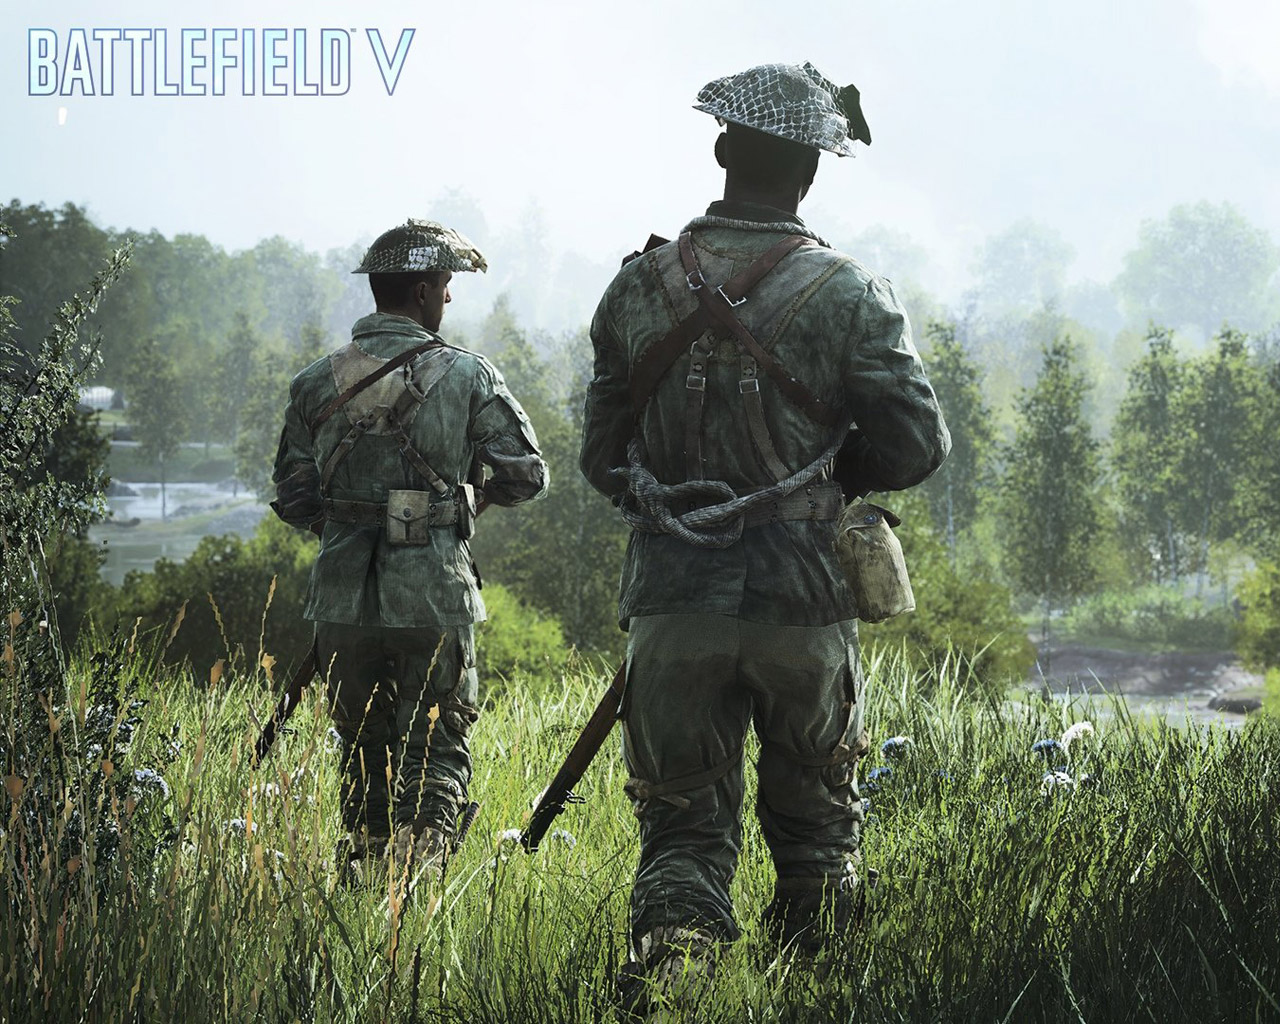 Free Battlefield V Wallpaper in 1280x1024